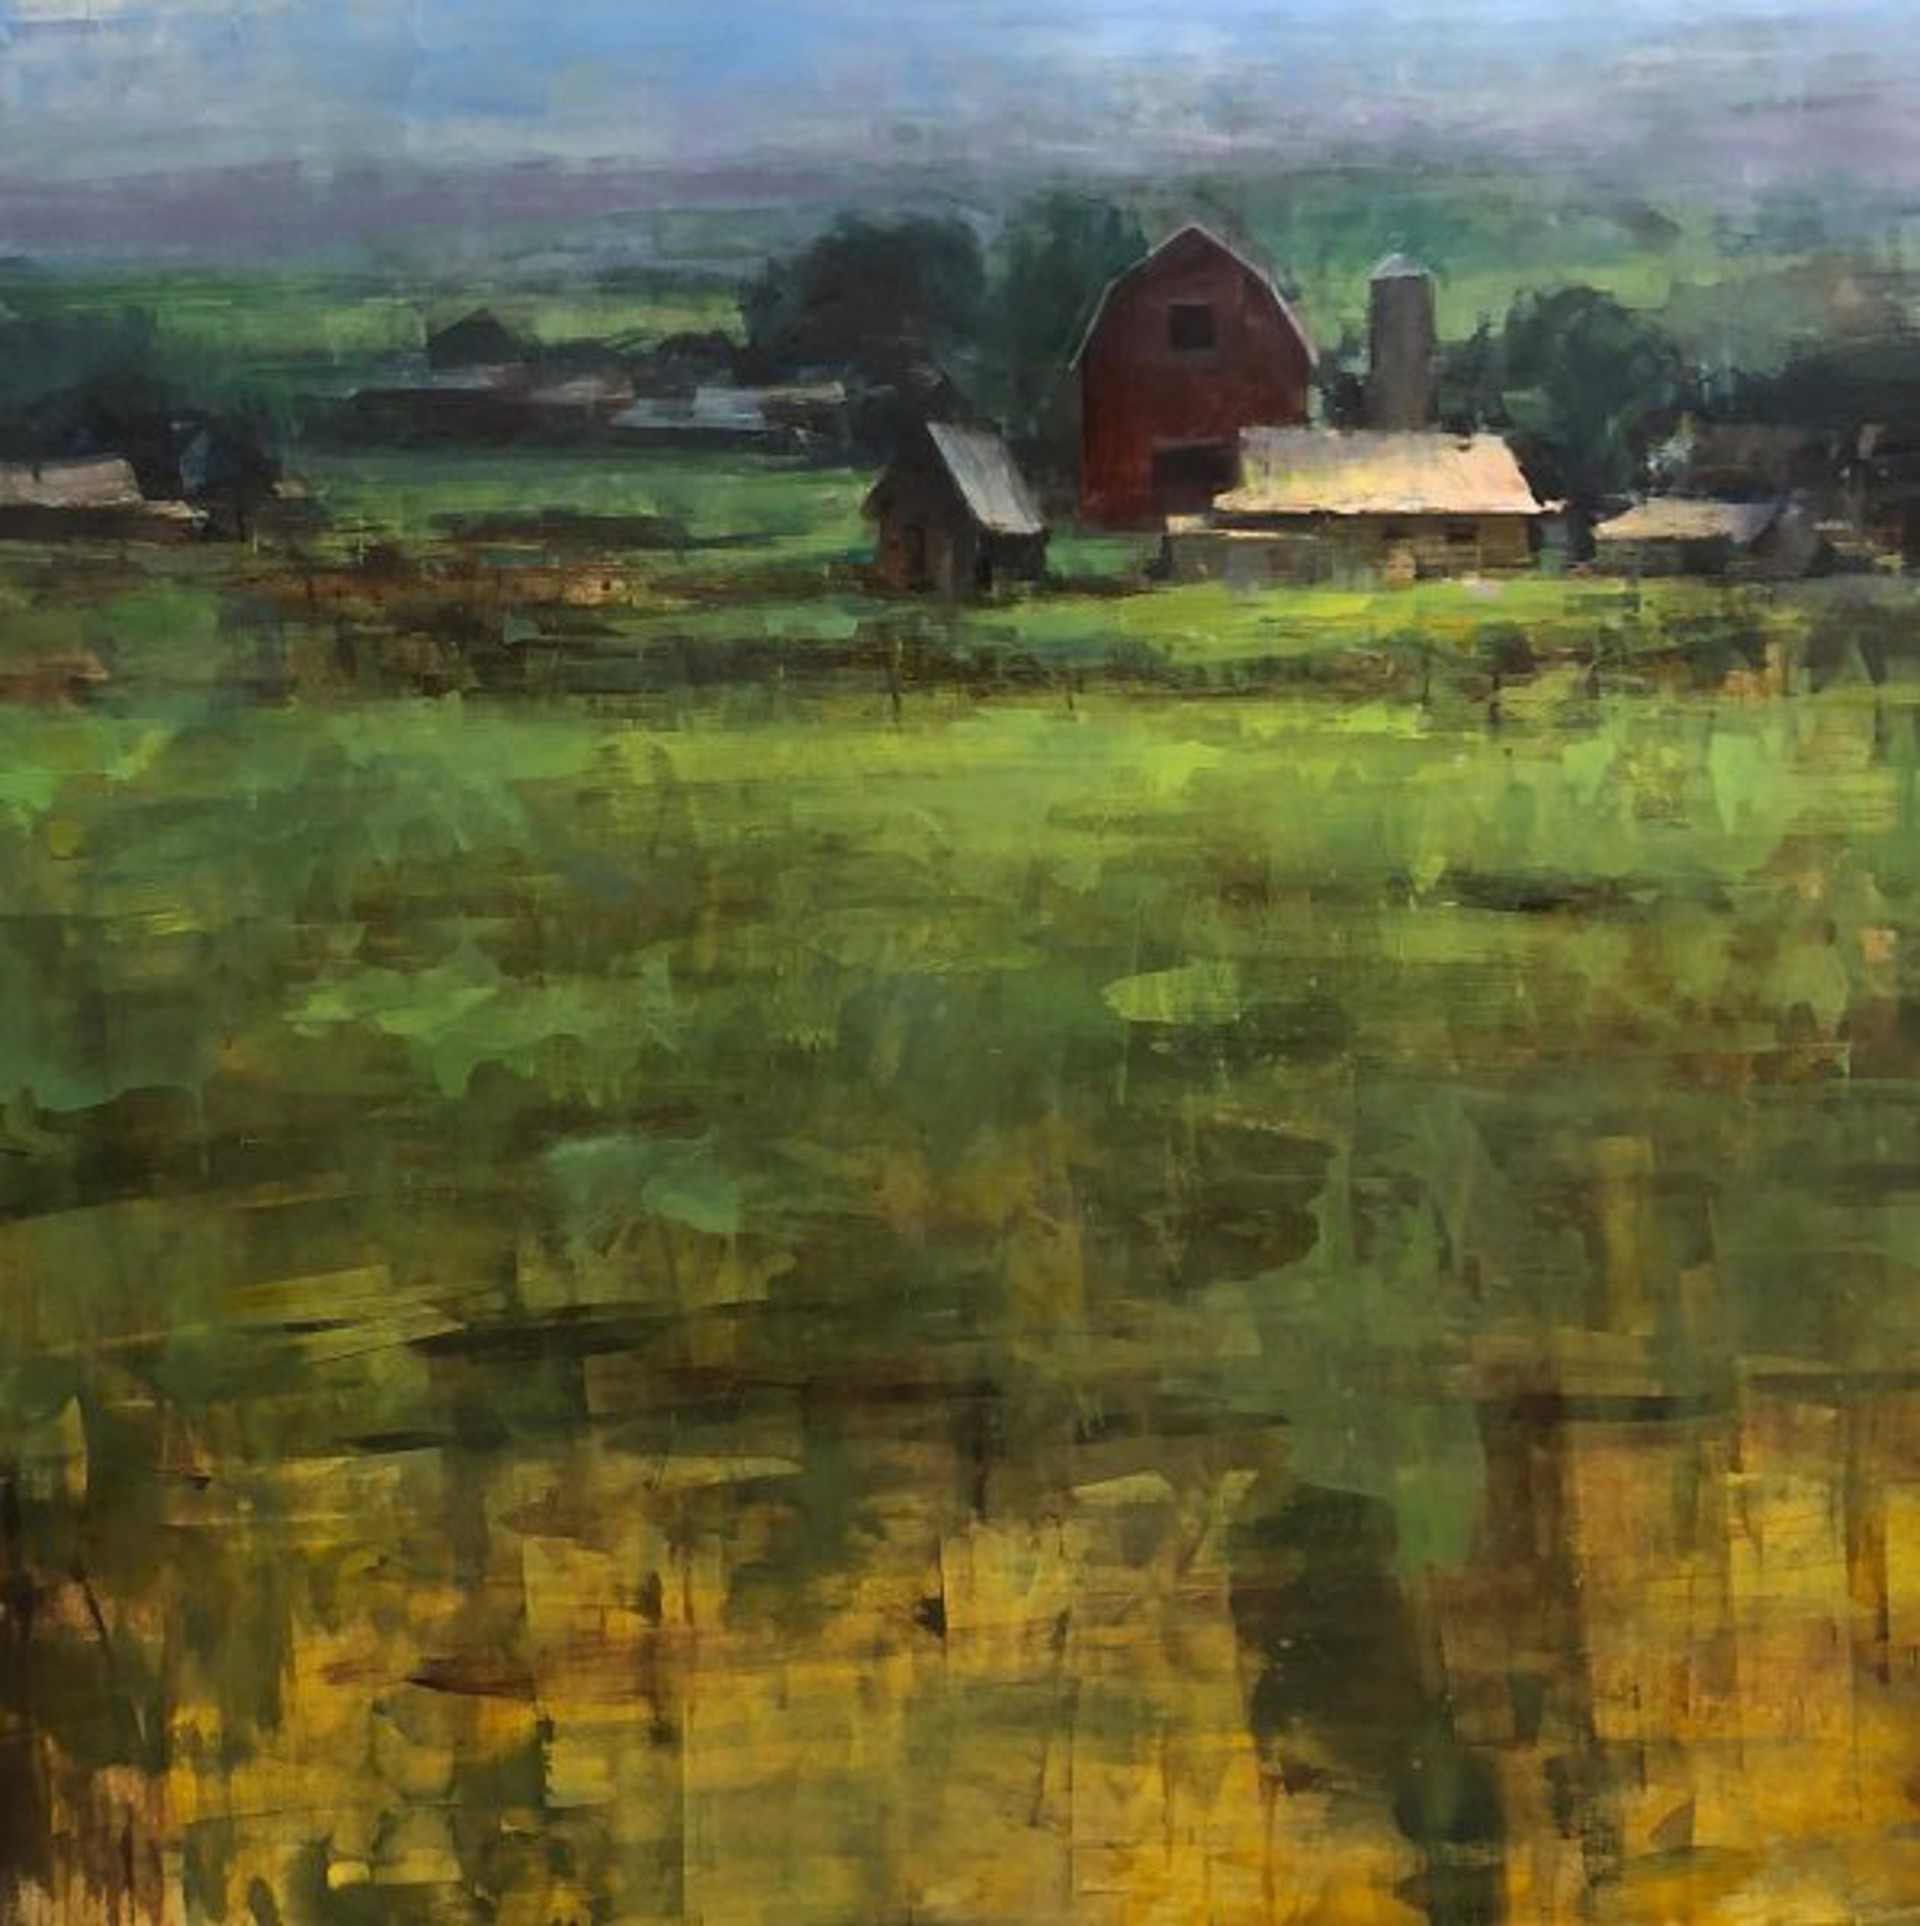 North Valley Farm by Bryan Mark Taylor